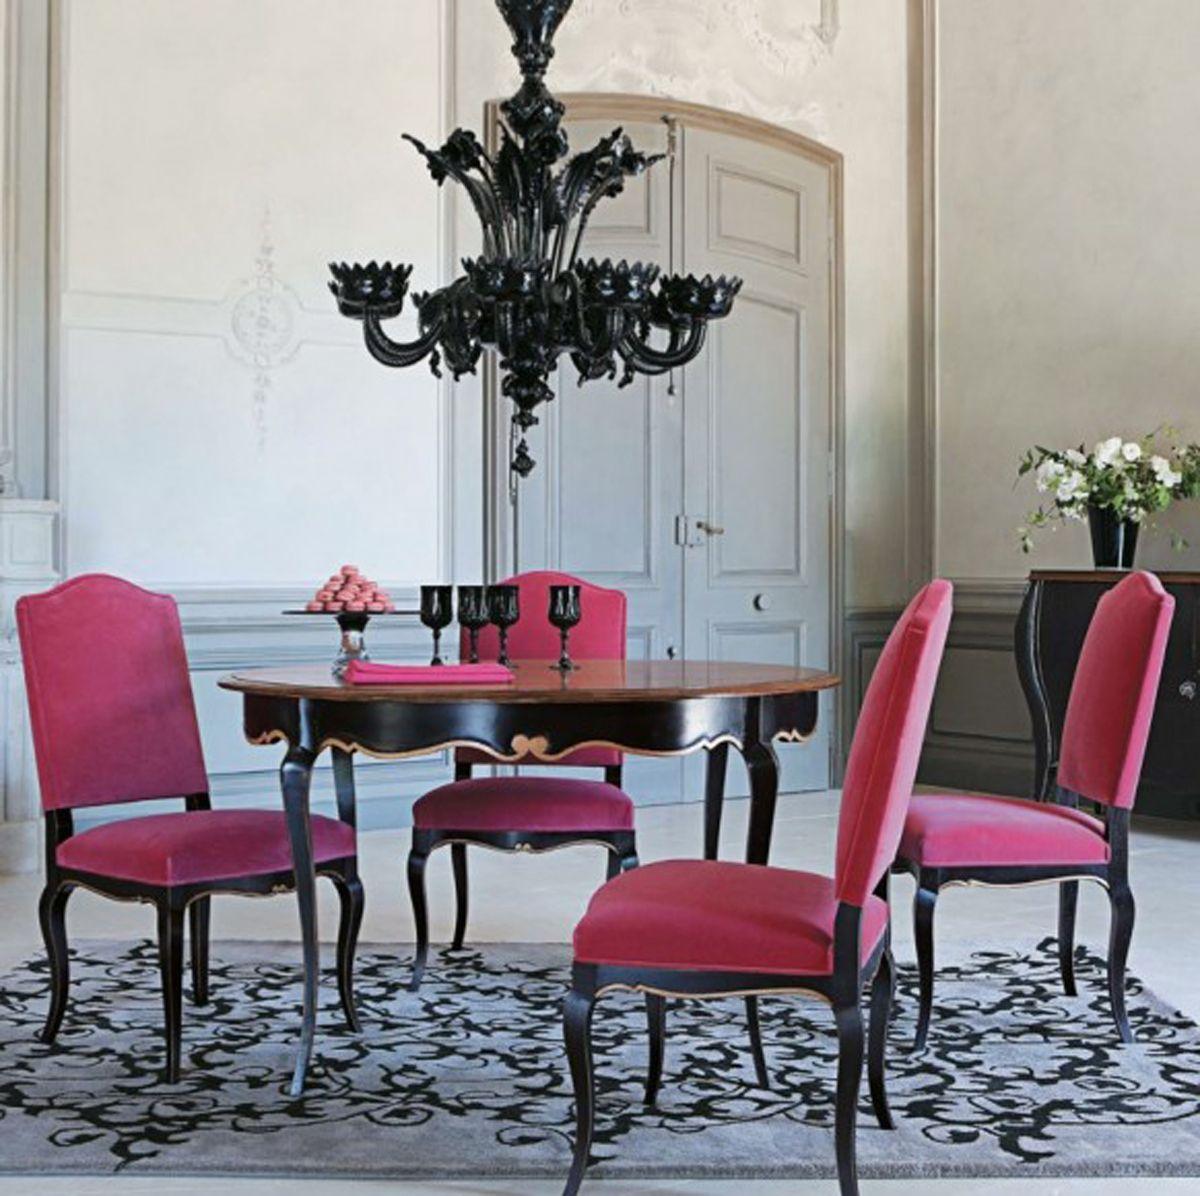 Diningroomdesigninpinkwhiteandblack  Dream Home  Girls Enchanting White And Black Dining Room Sets Inspiration